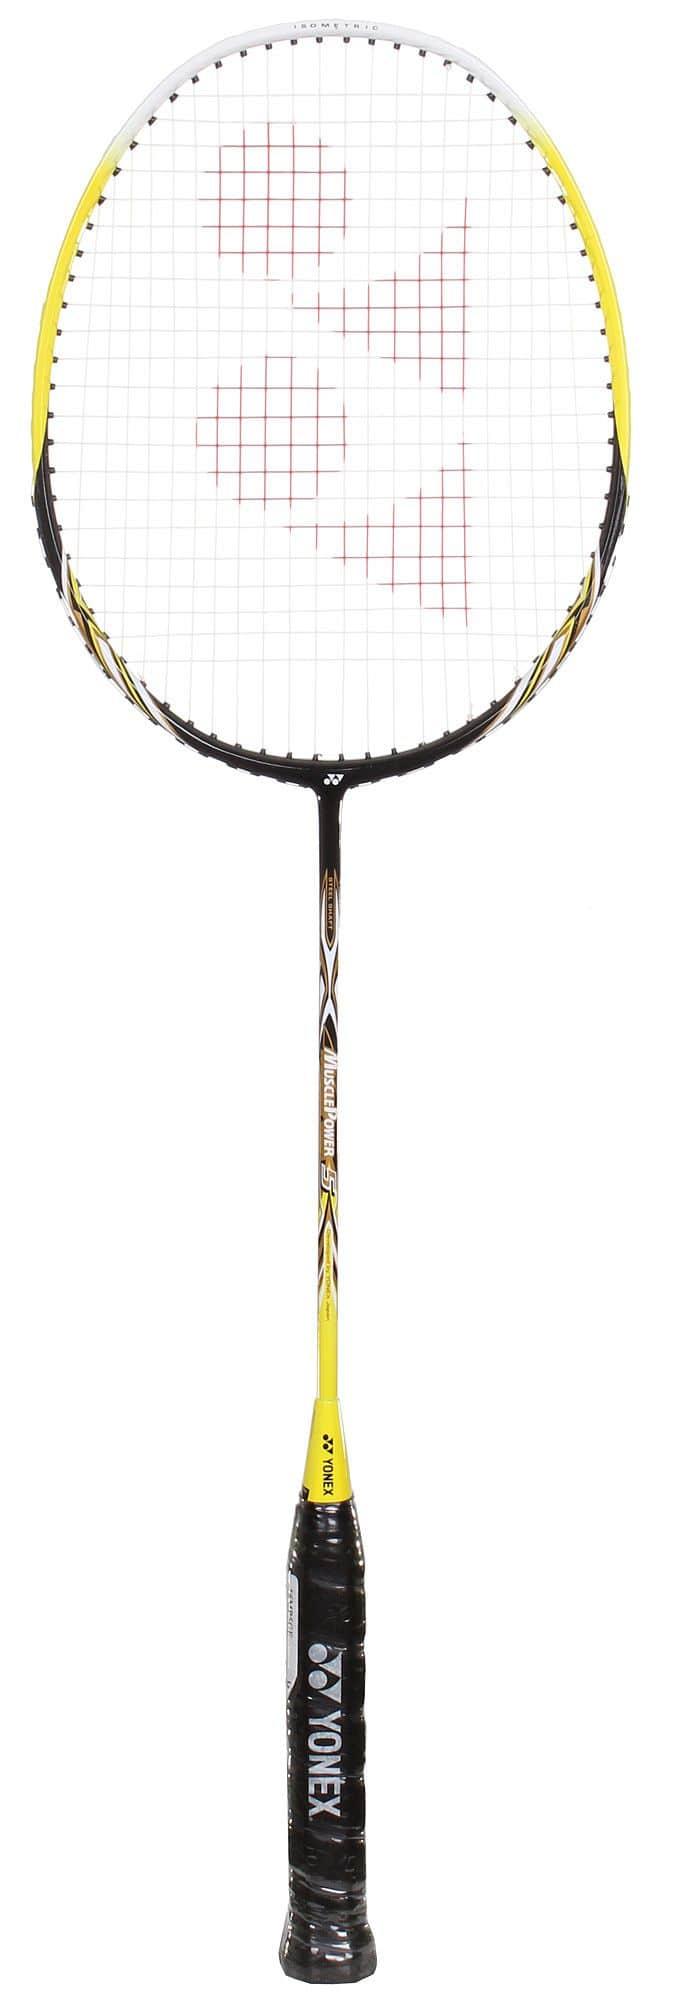 Muscle Power 5 badmintonová raketa barva: černá-žlutá